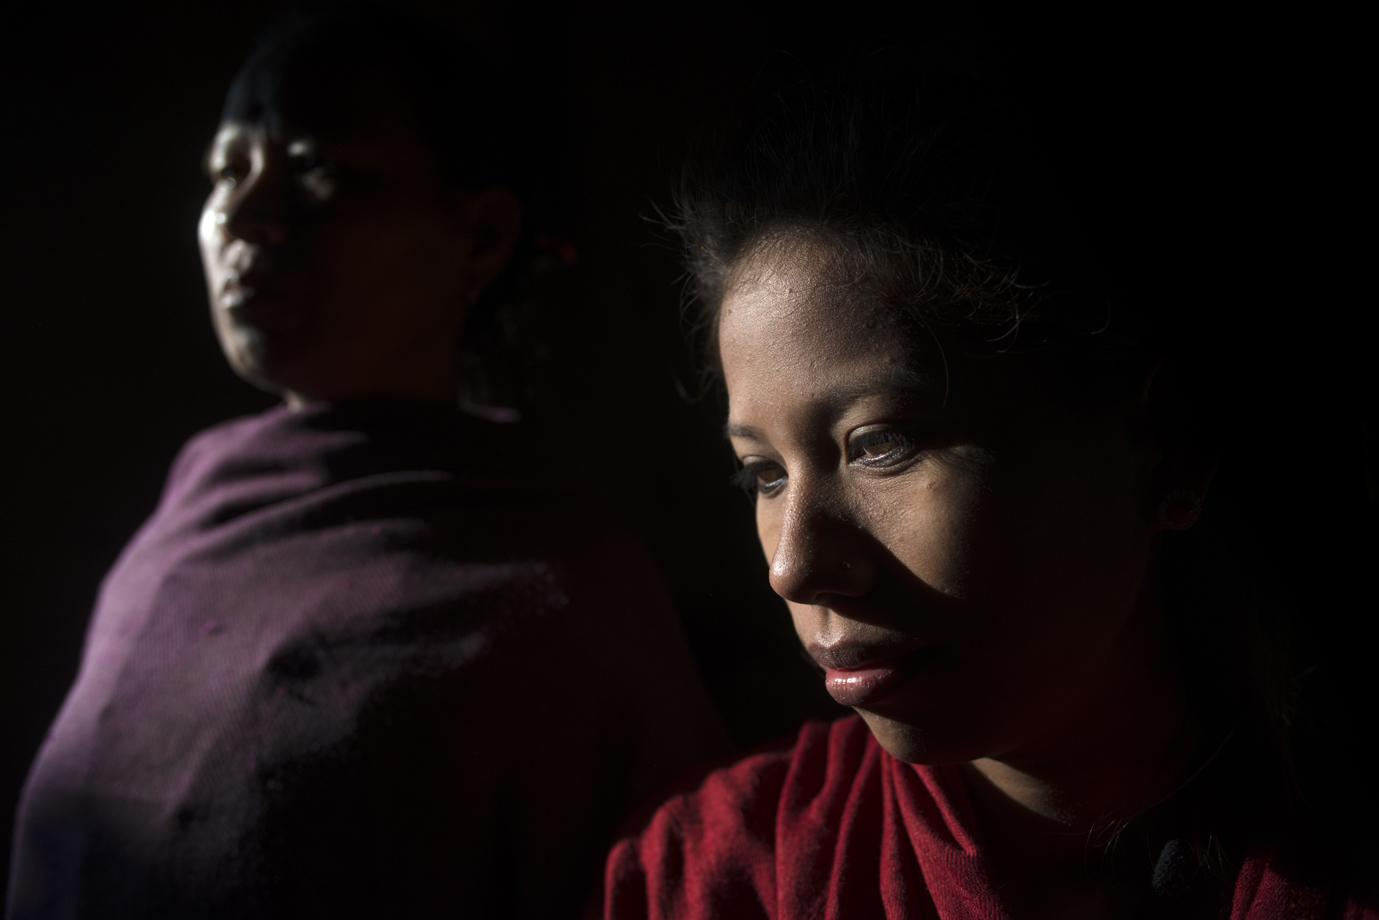 A former child slave from the Kamalari caste, Terai region / Nepal